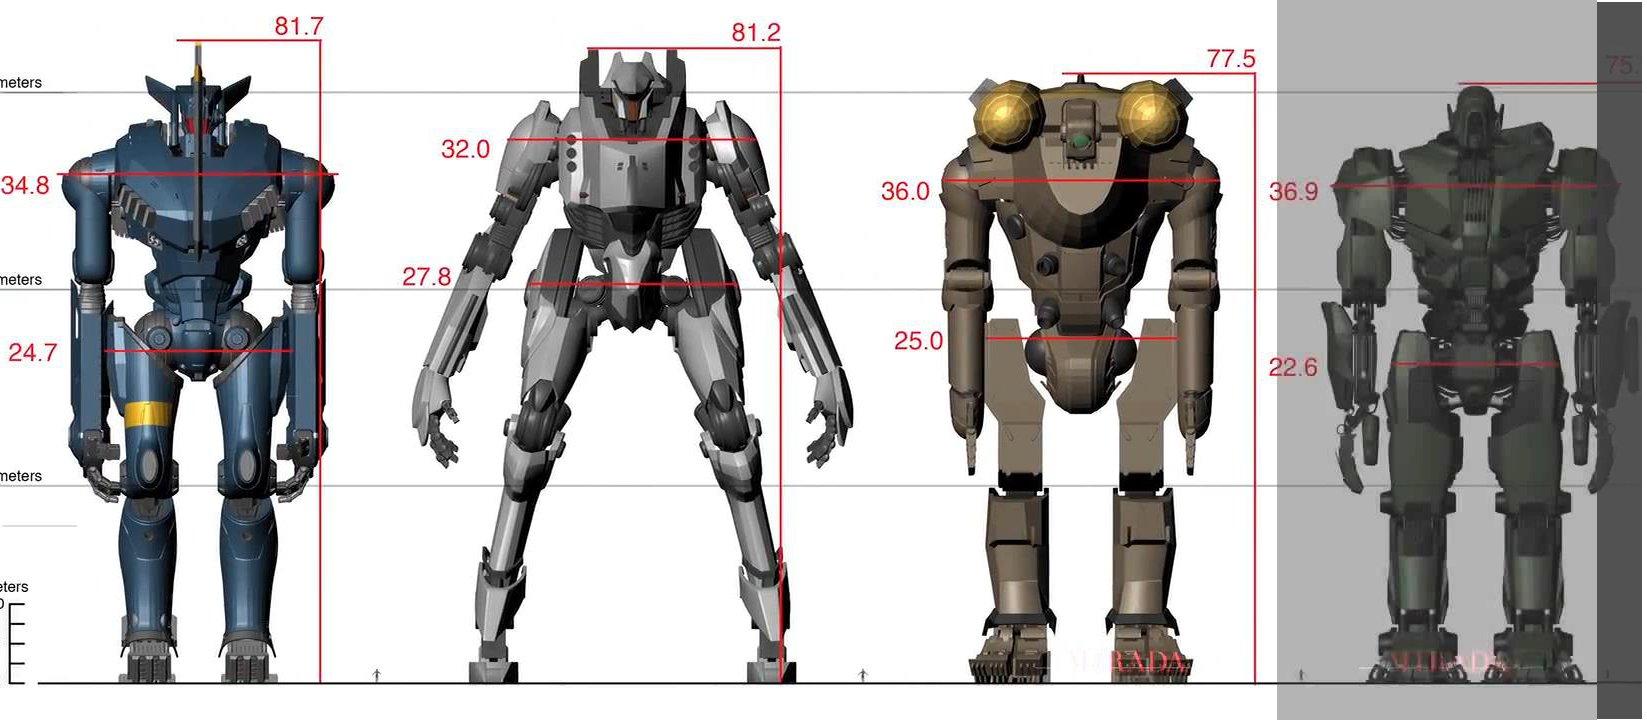 Jaeger Size Chart Image - Jaeger to Jaeg...